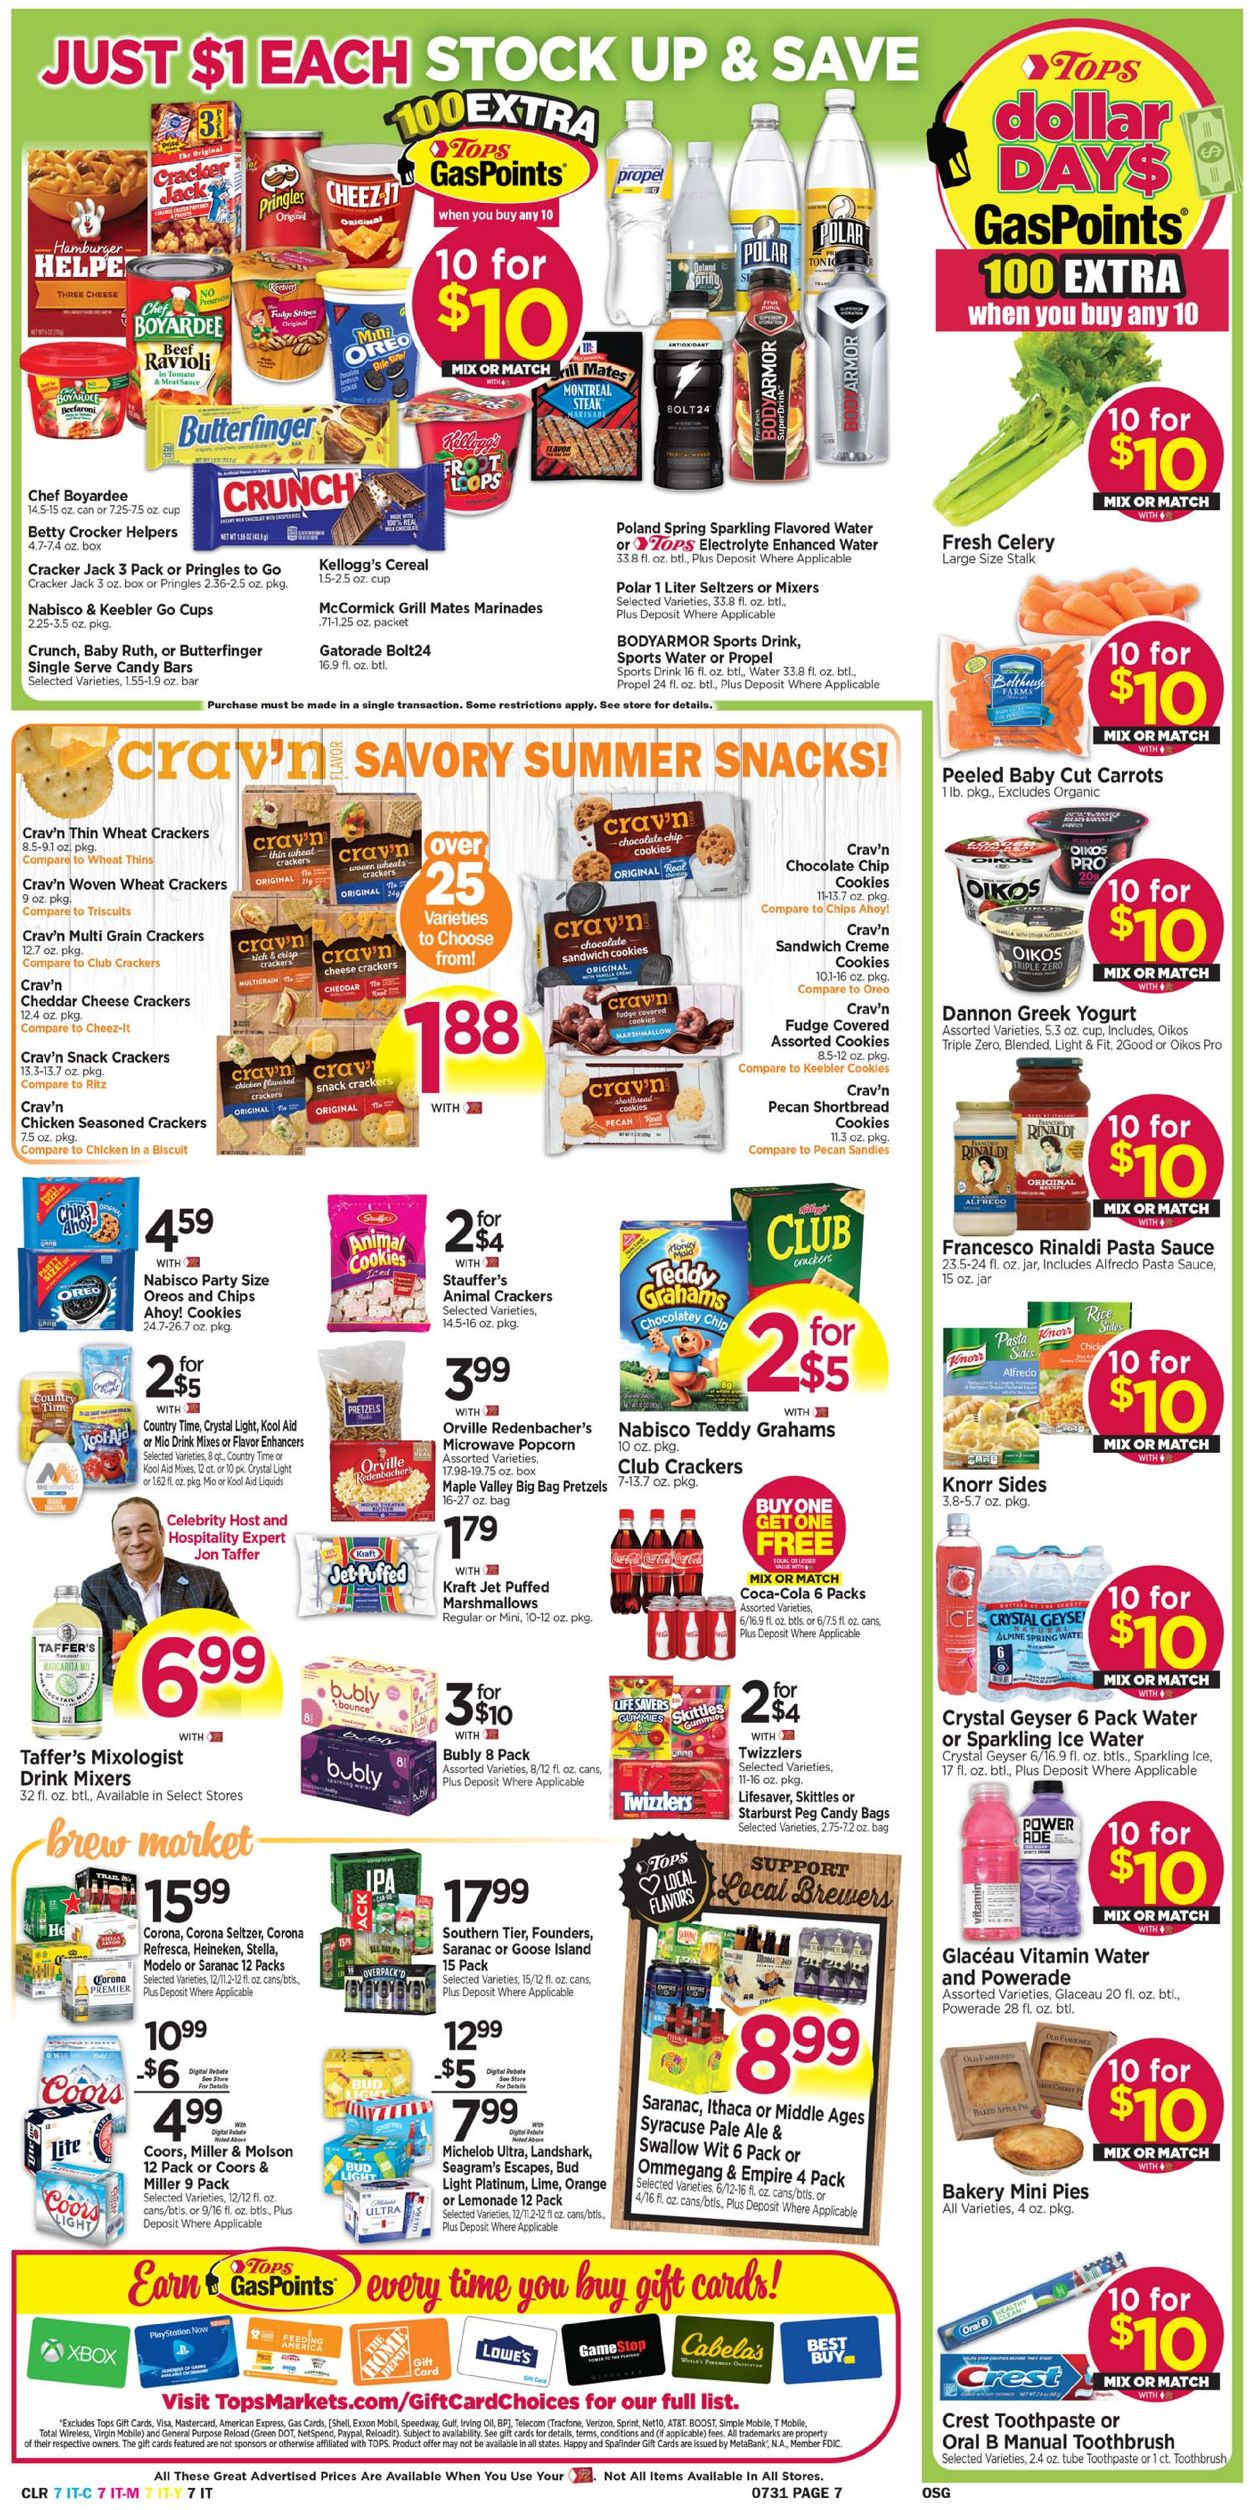 Tops Friendly Markets Weekly Ad Circular - valid 07/25-07/31/2021 (Page 7)